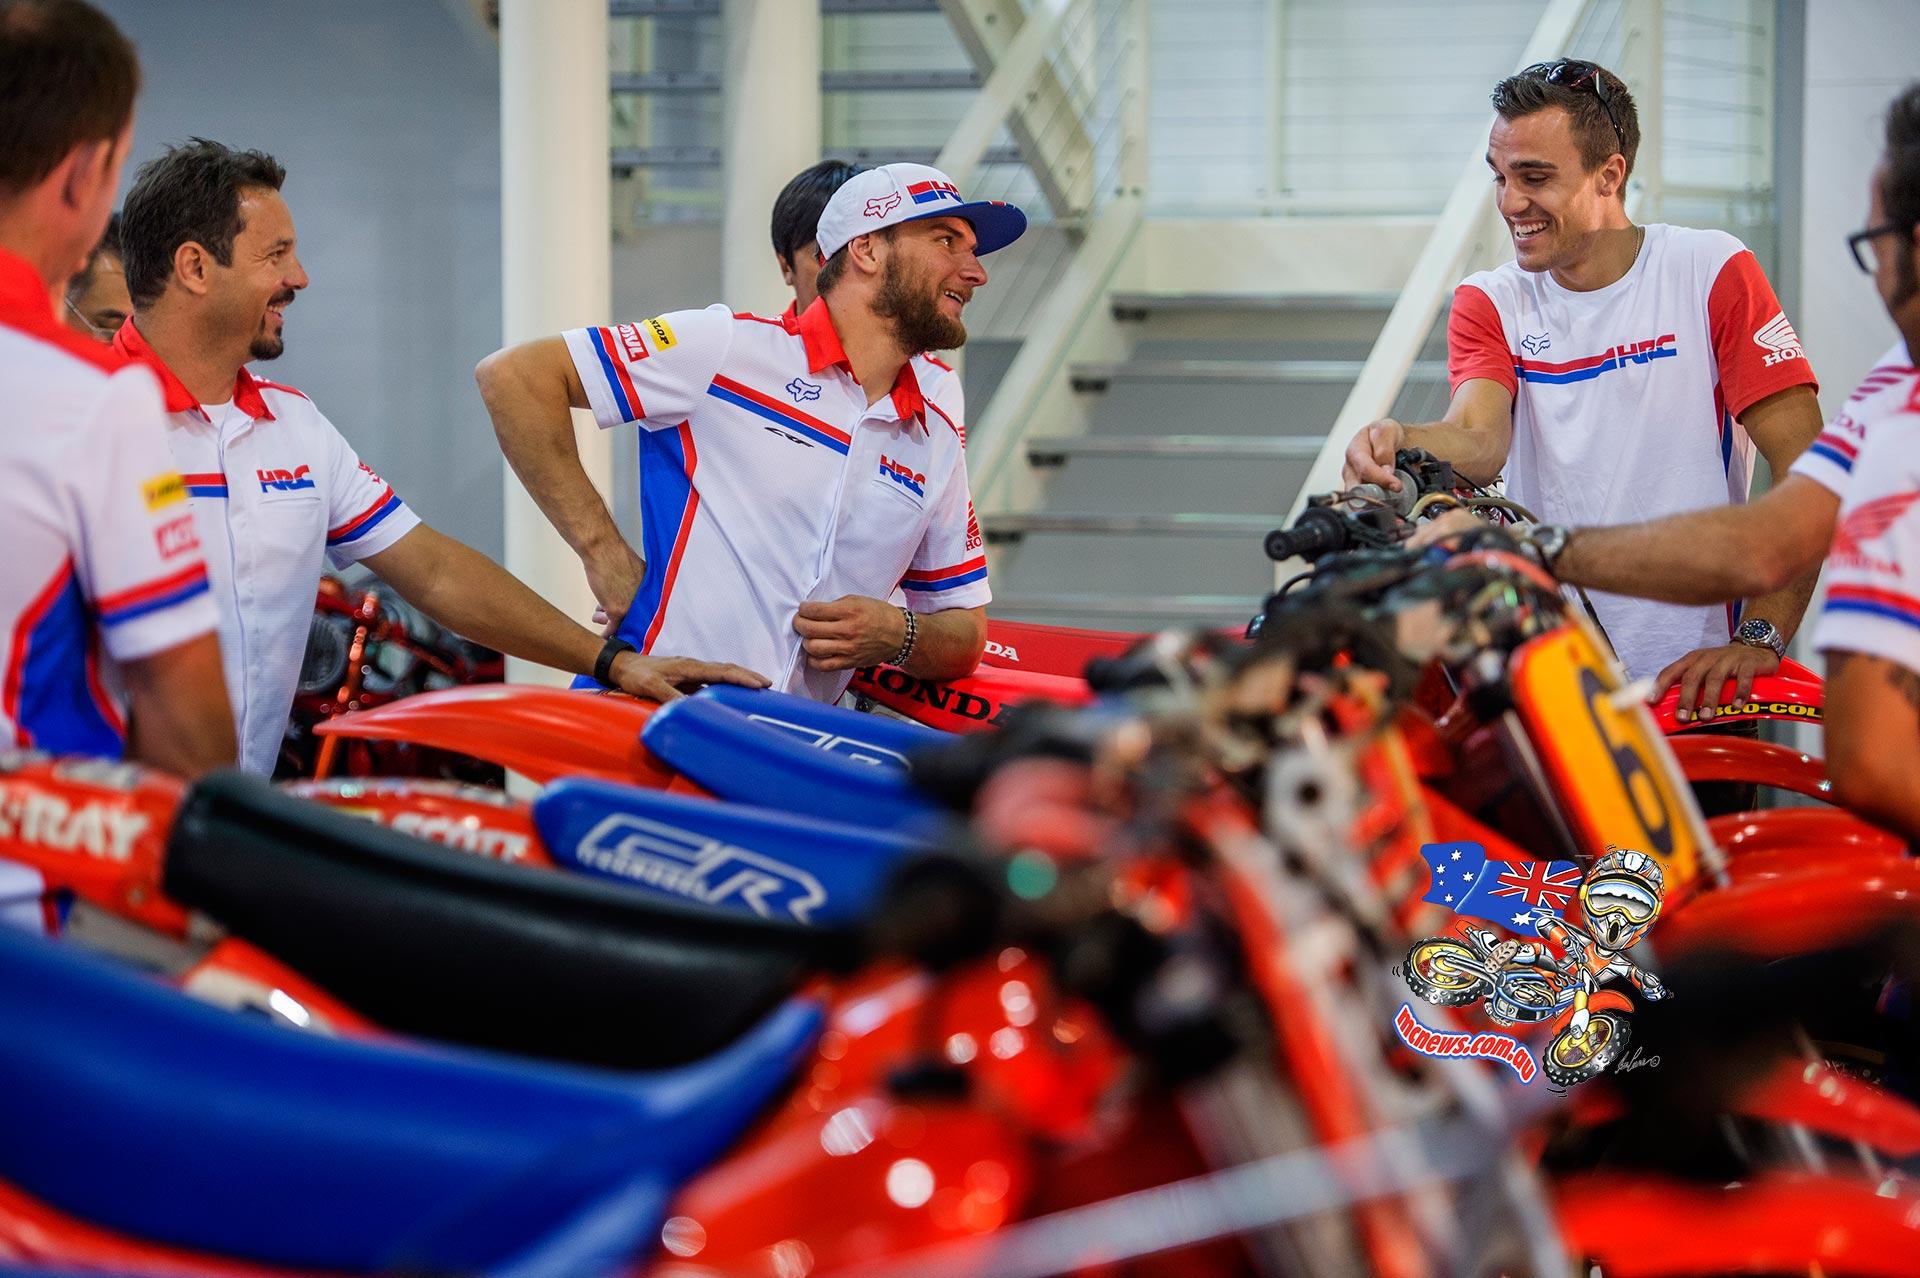 Gautier Paulin, Evgeny Bobryshev, Team HRC